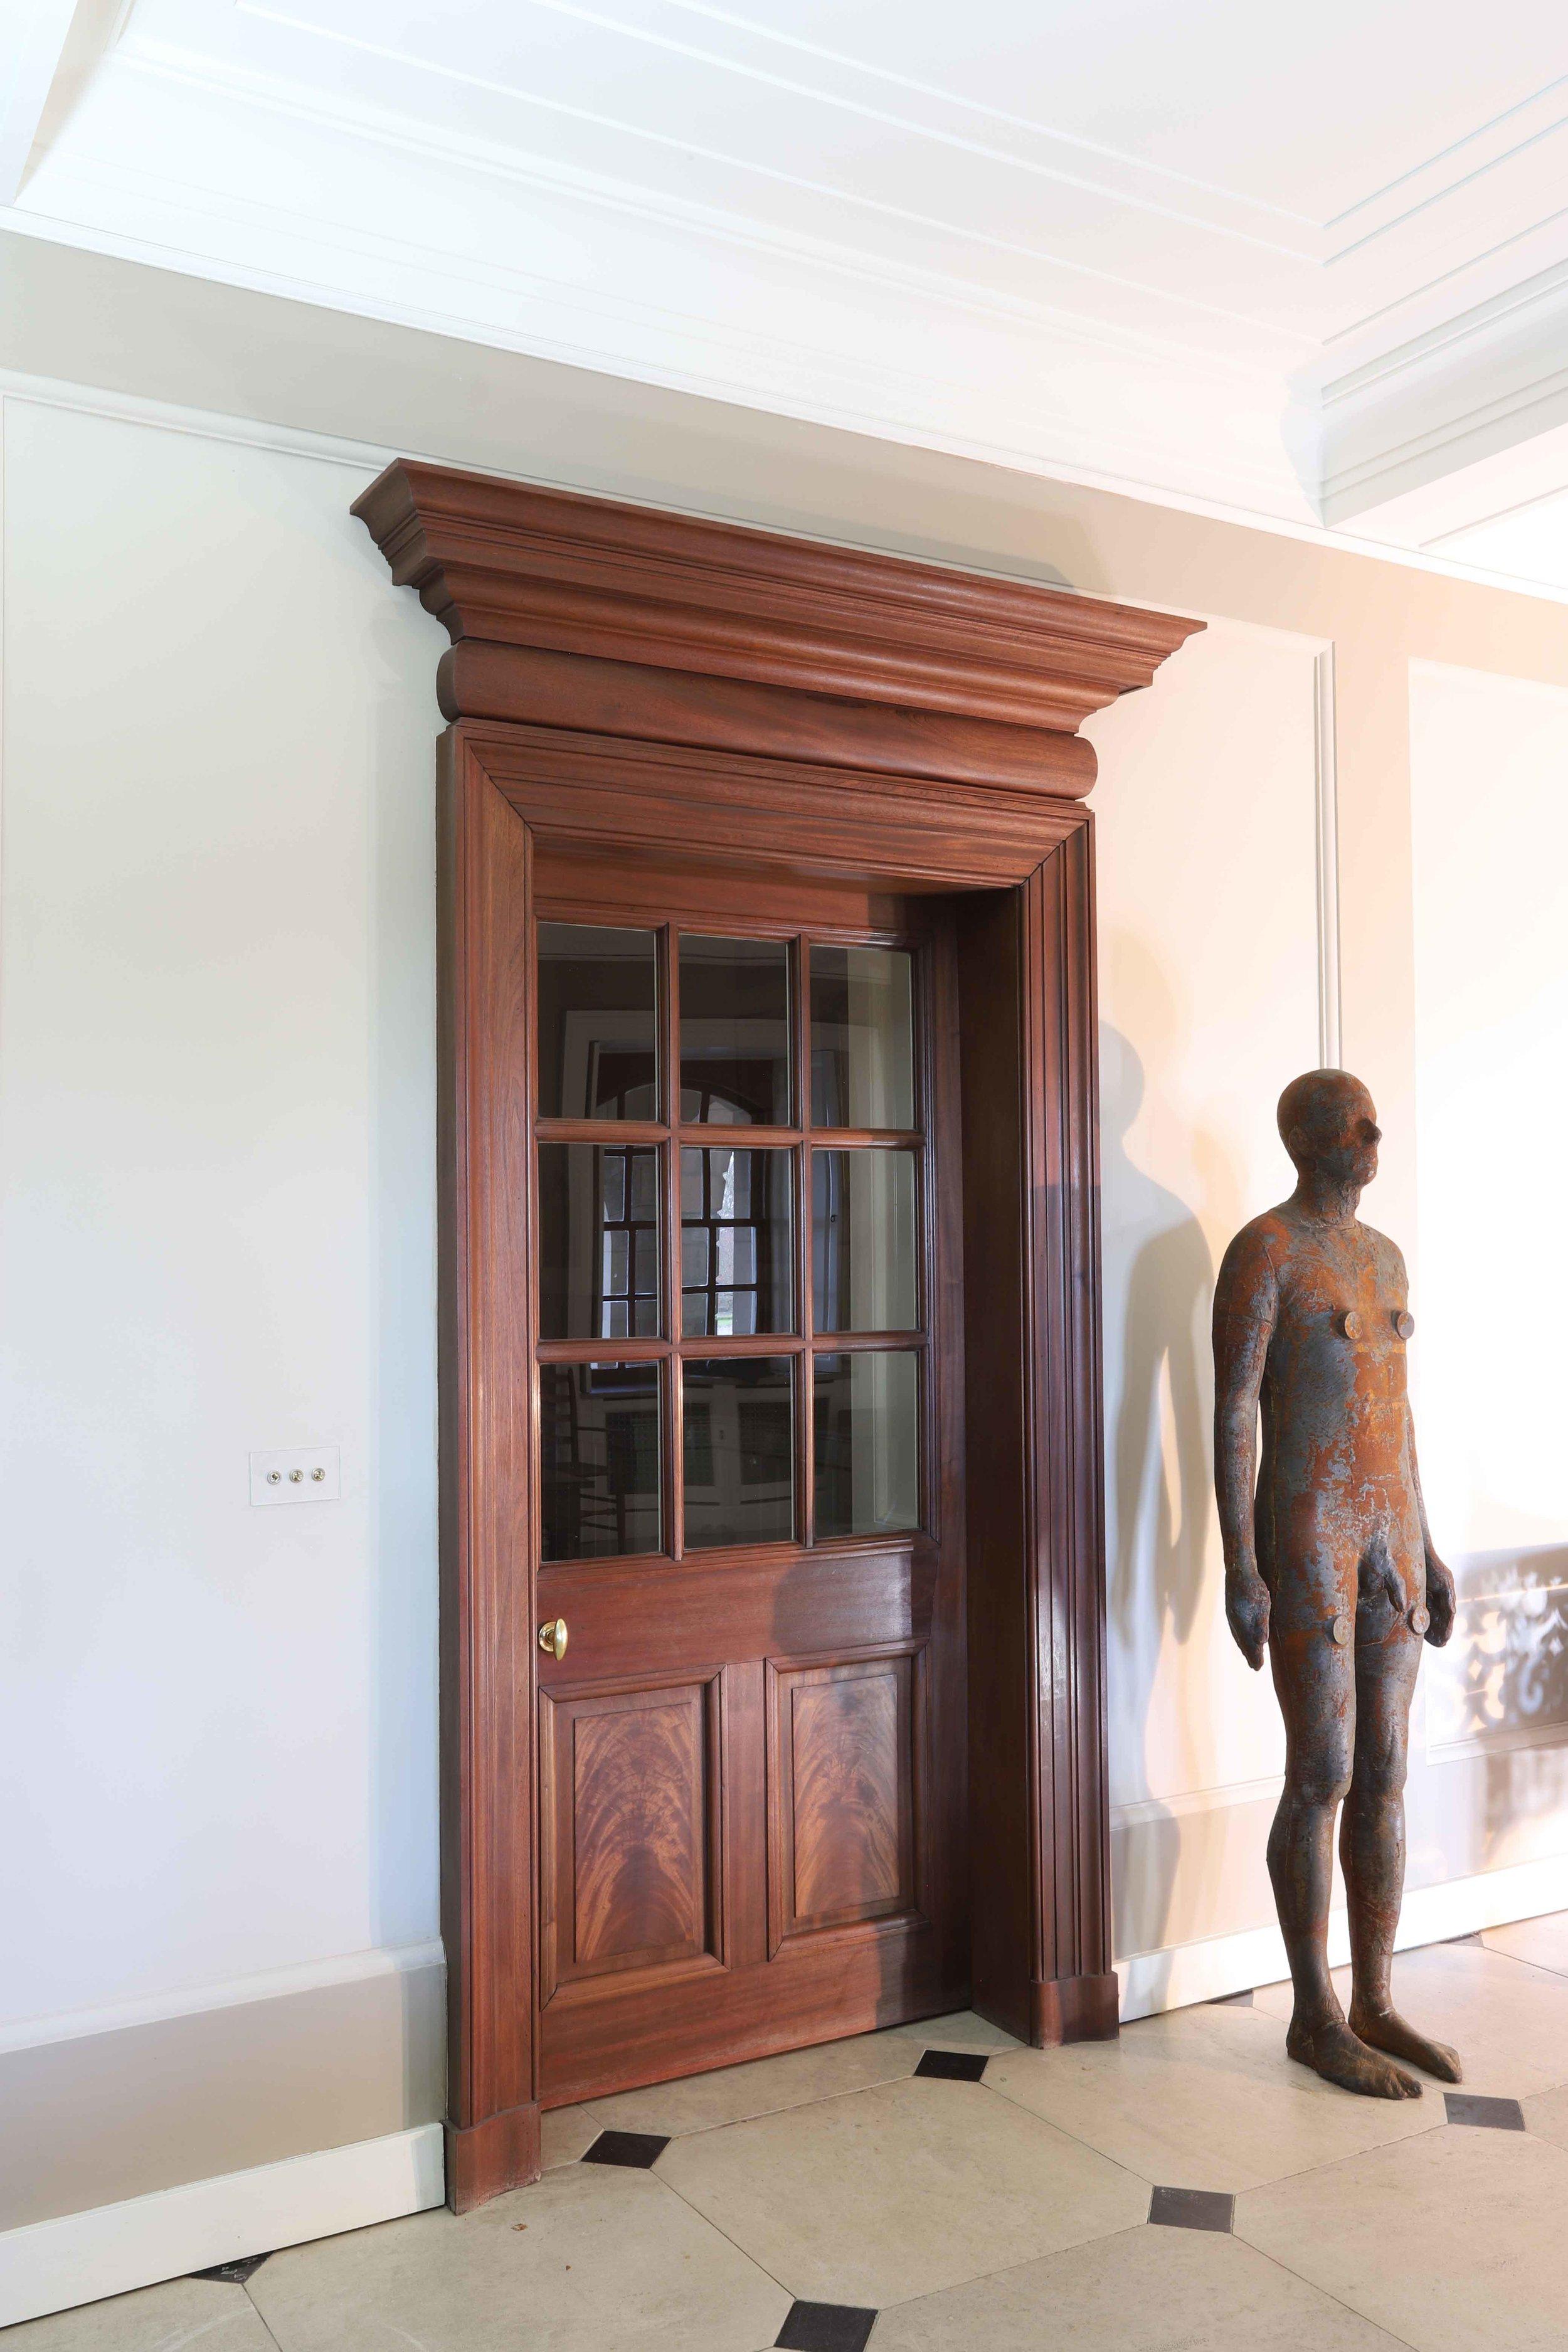 Reproduction Robert Lorimer door scheme, Marchmont house.